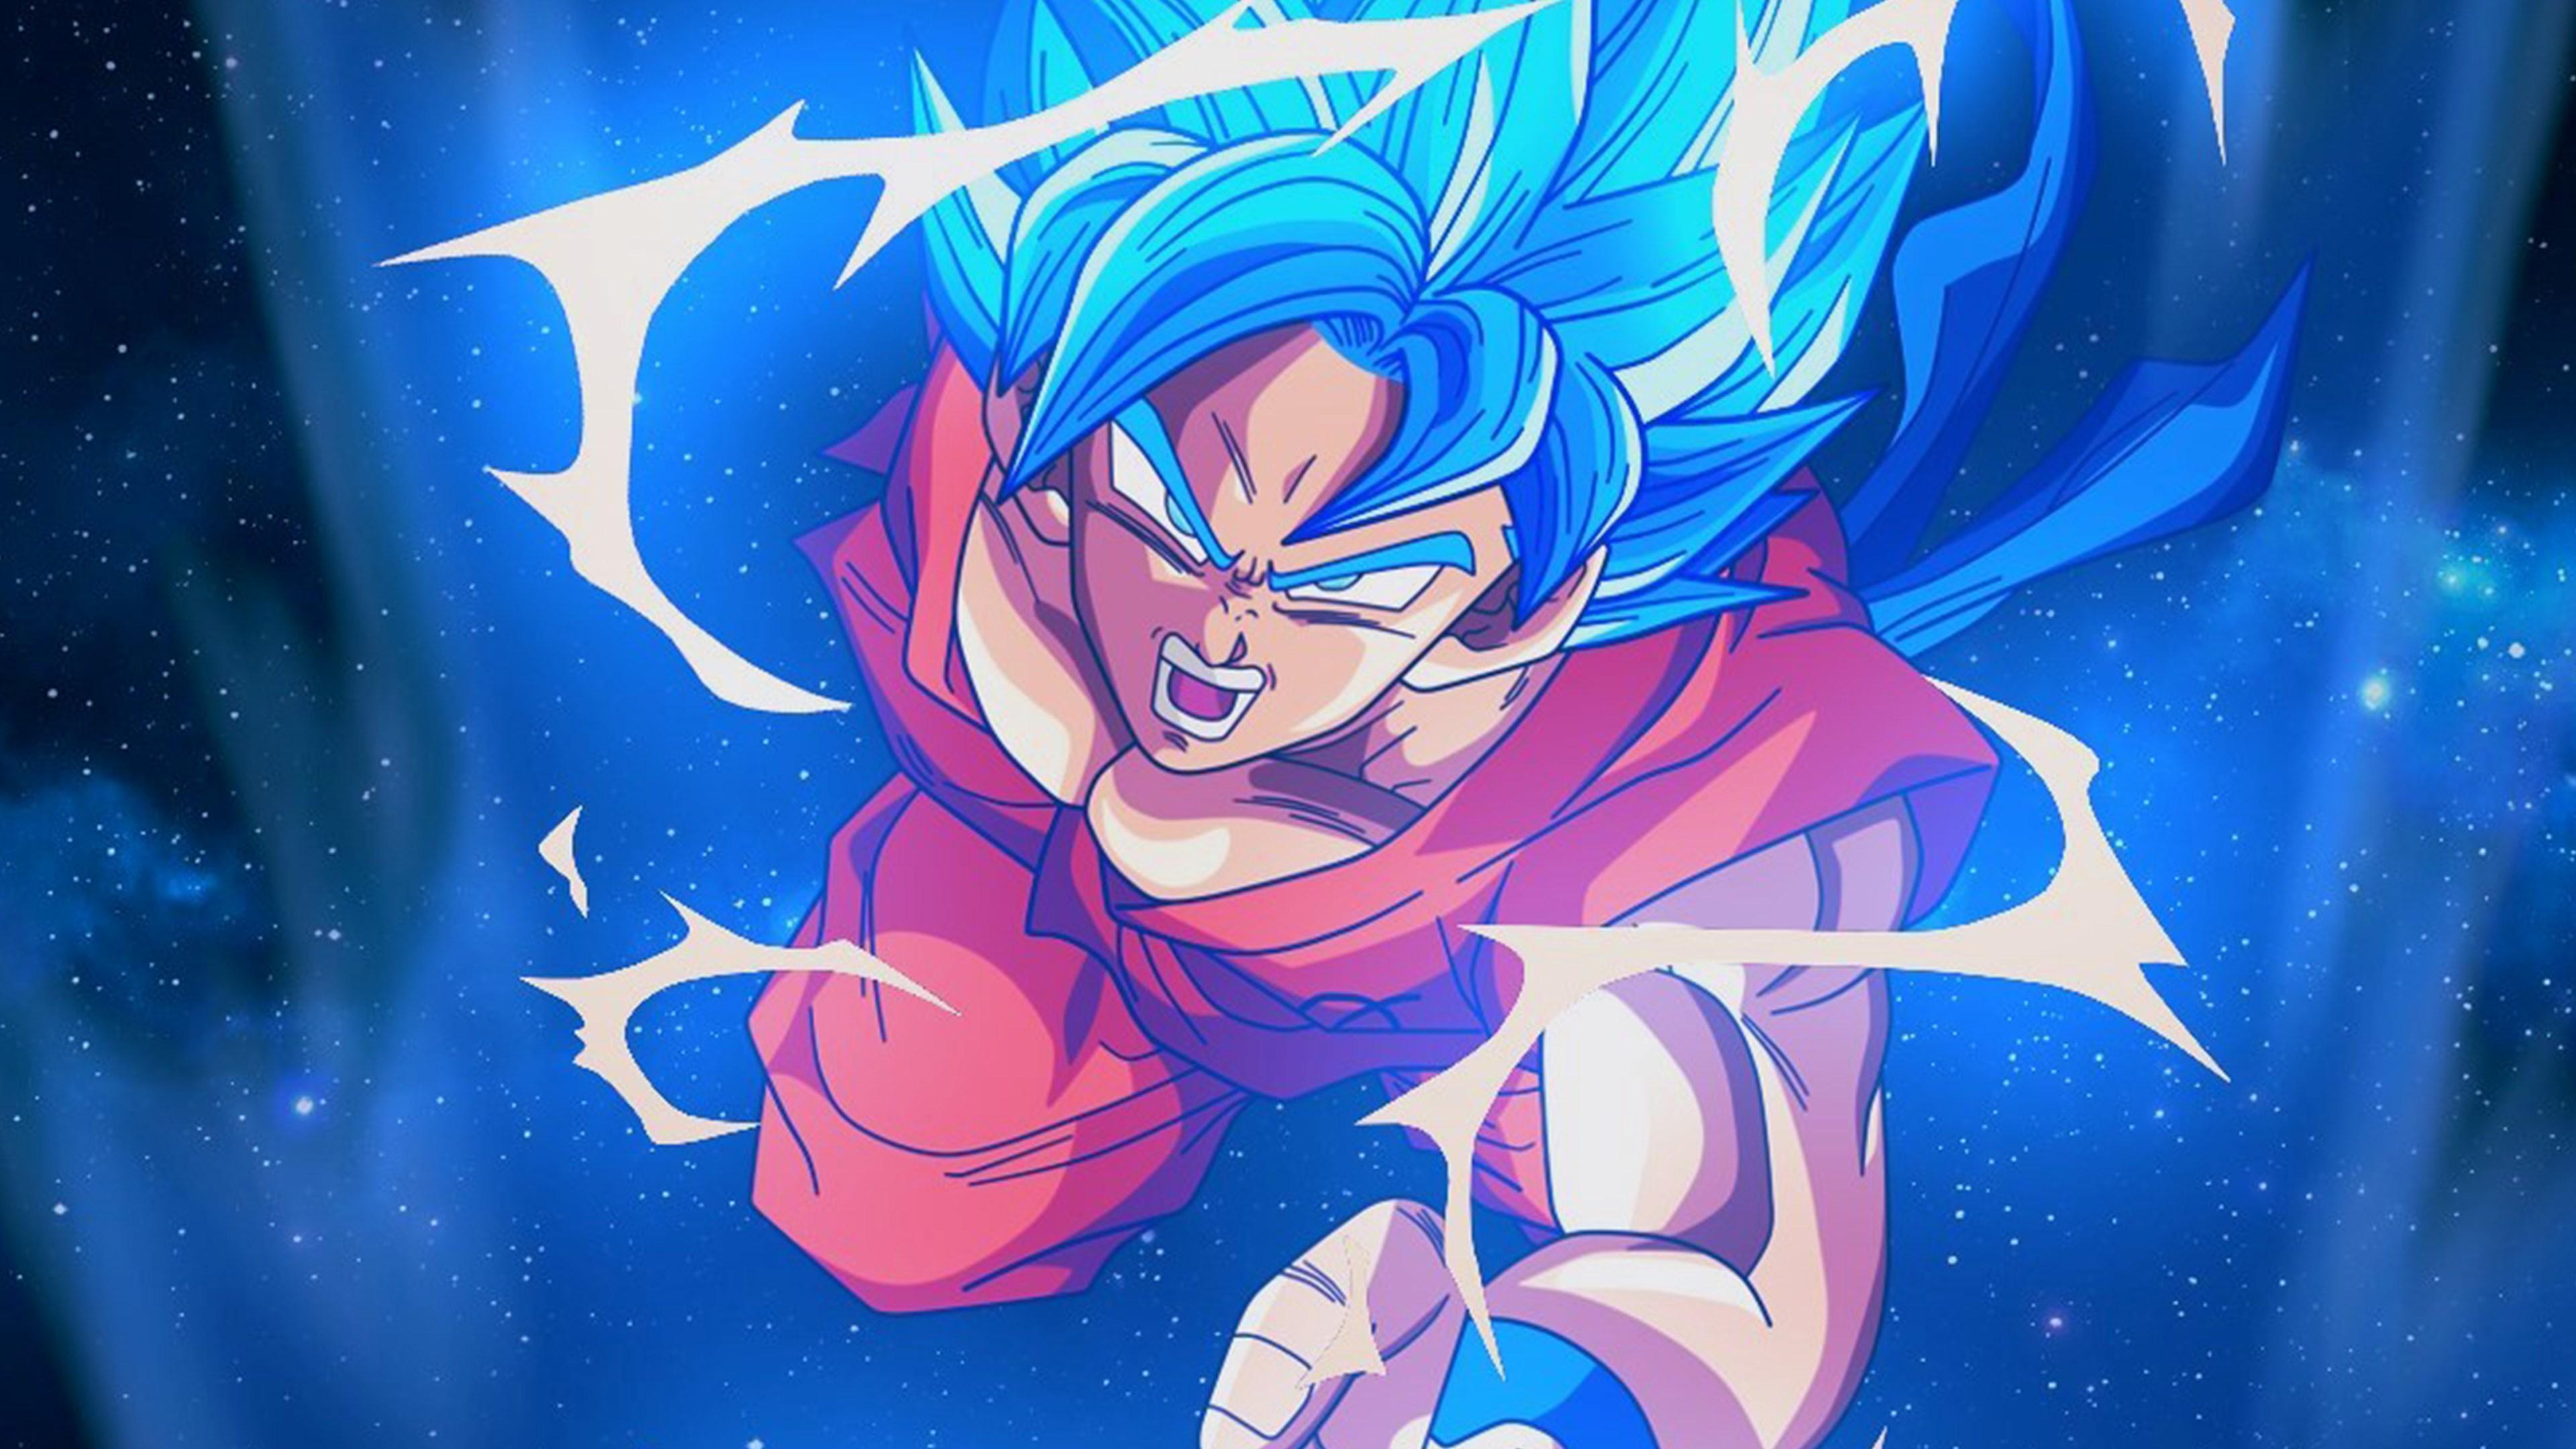 Bc54 Dragonball Goku Blue Art Illustration Anime Wallpaper